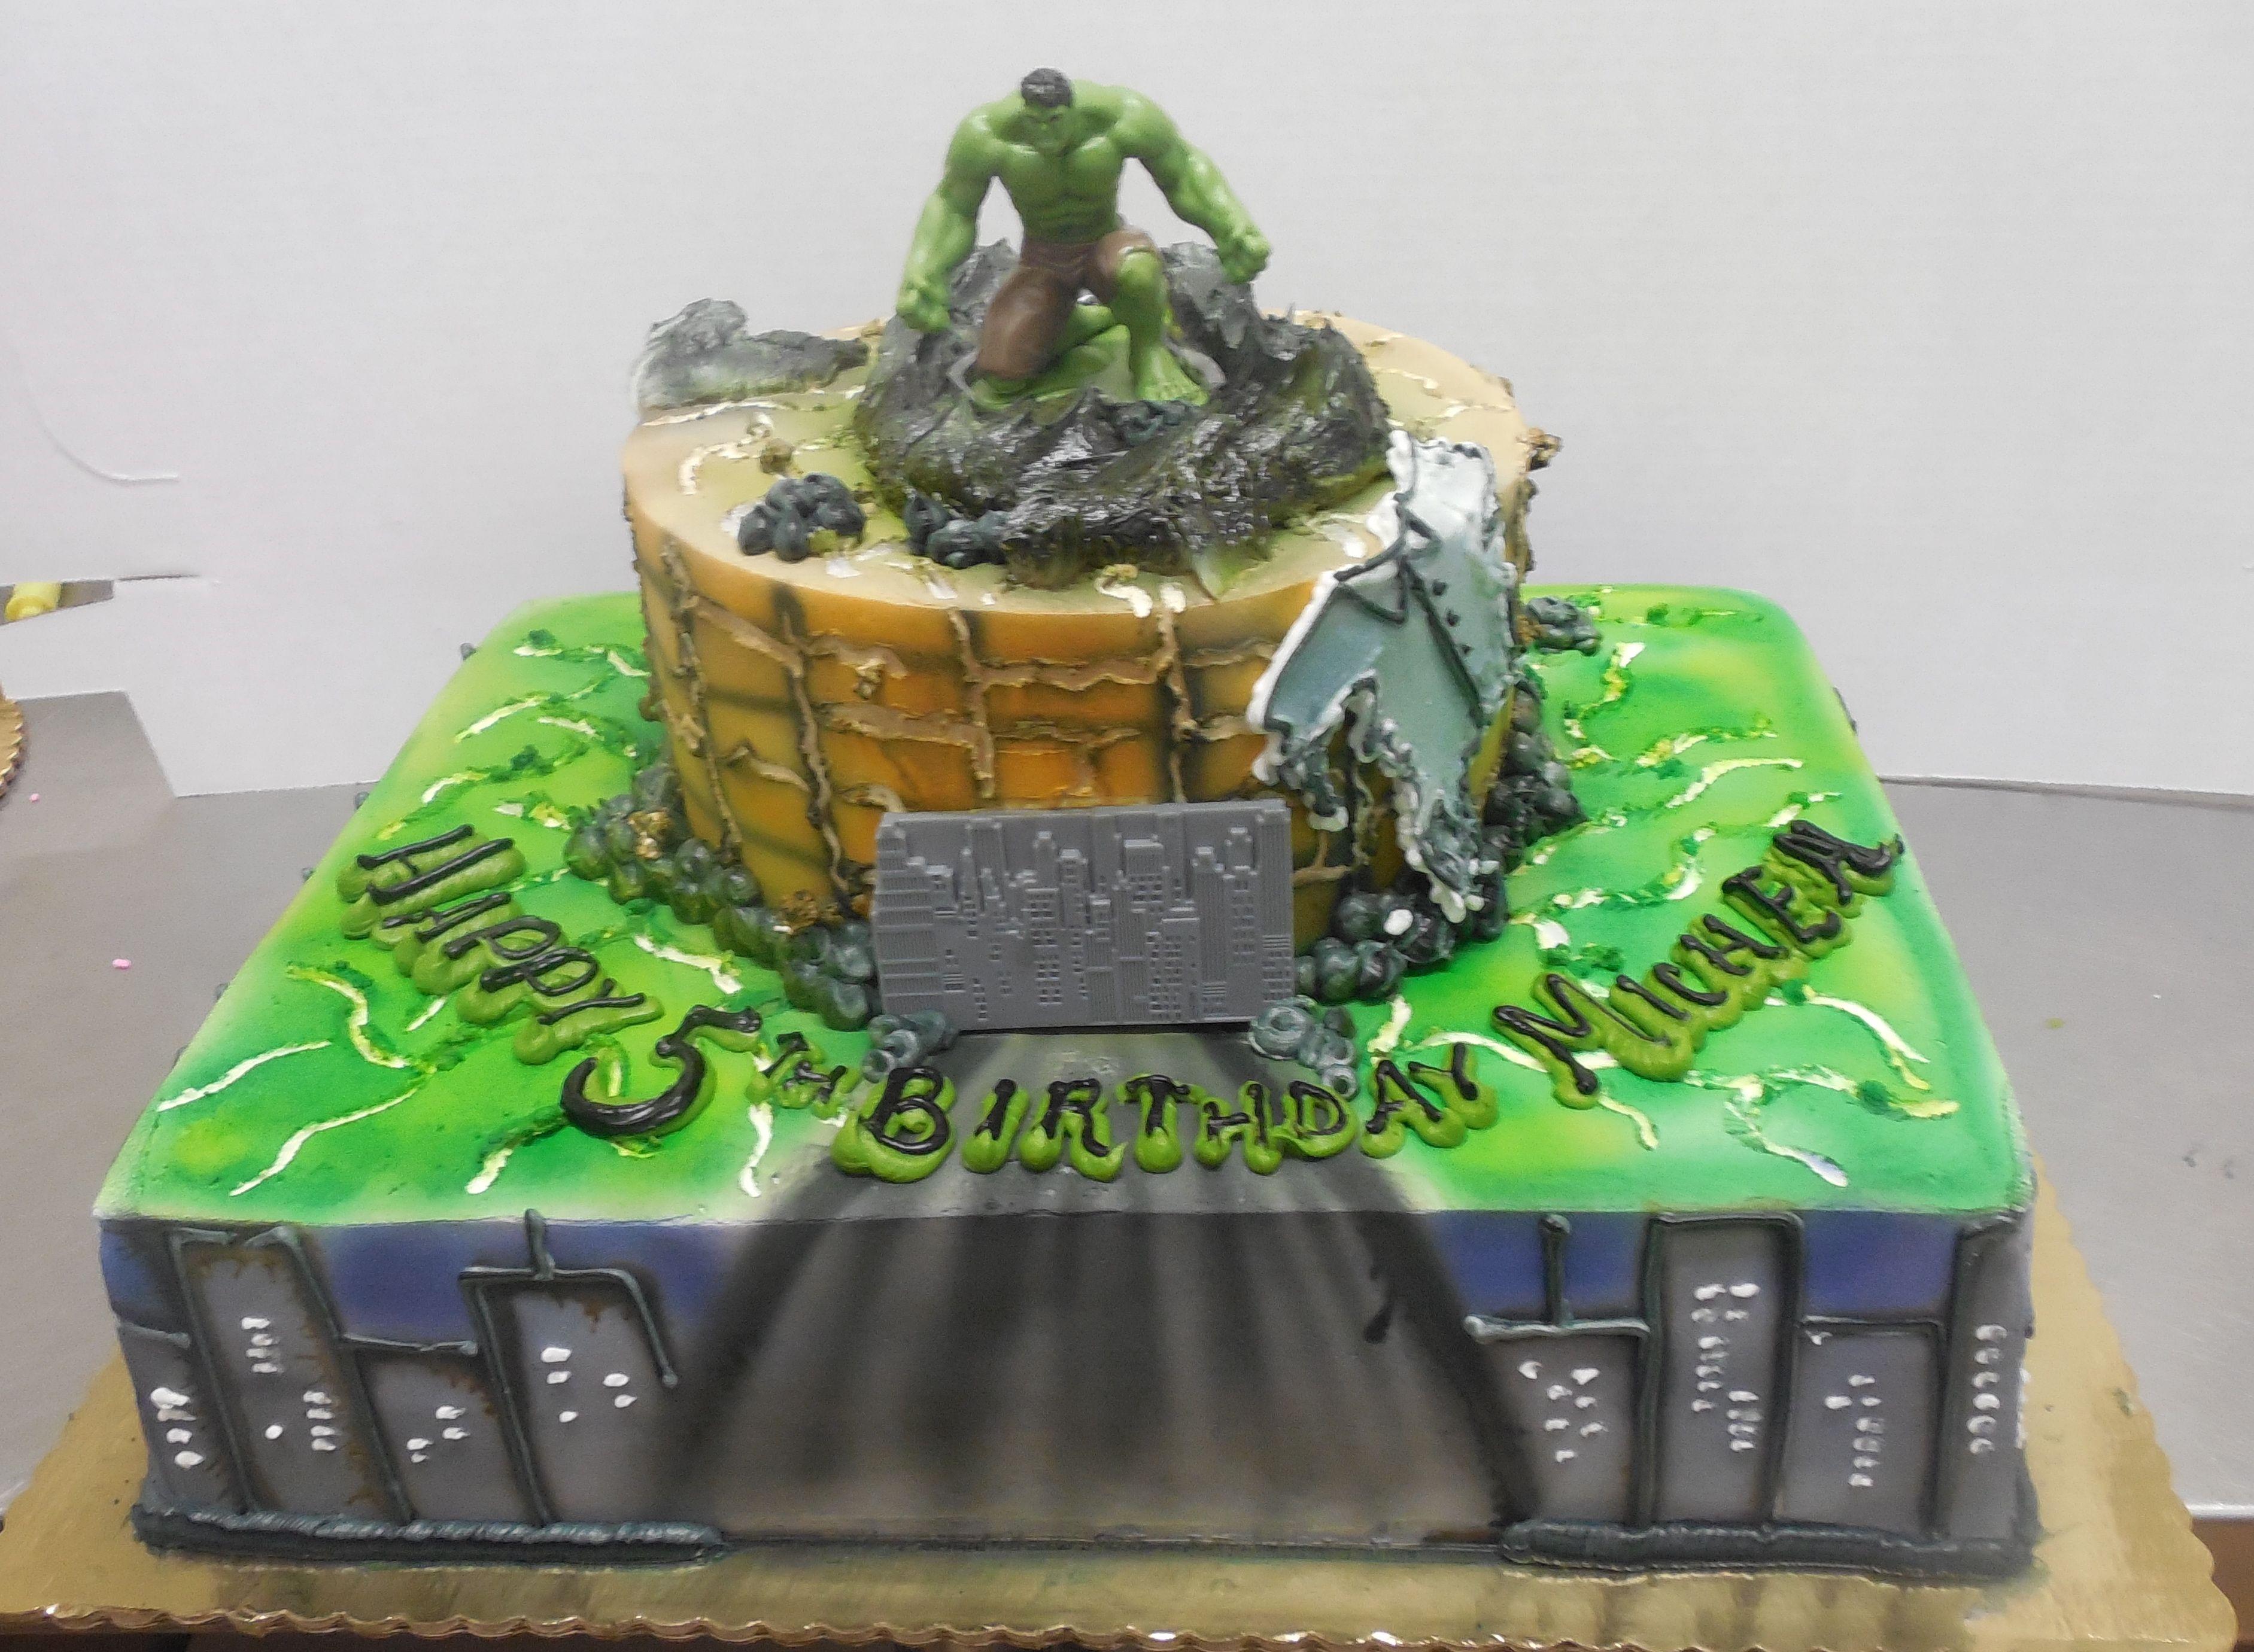 Calumet bakery hulk birthday cake hulk birthday cakes